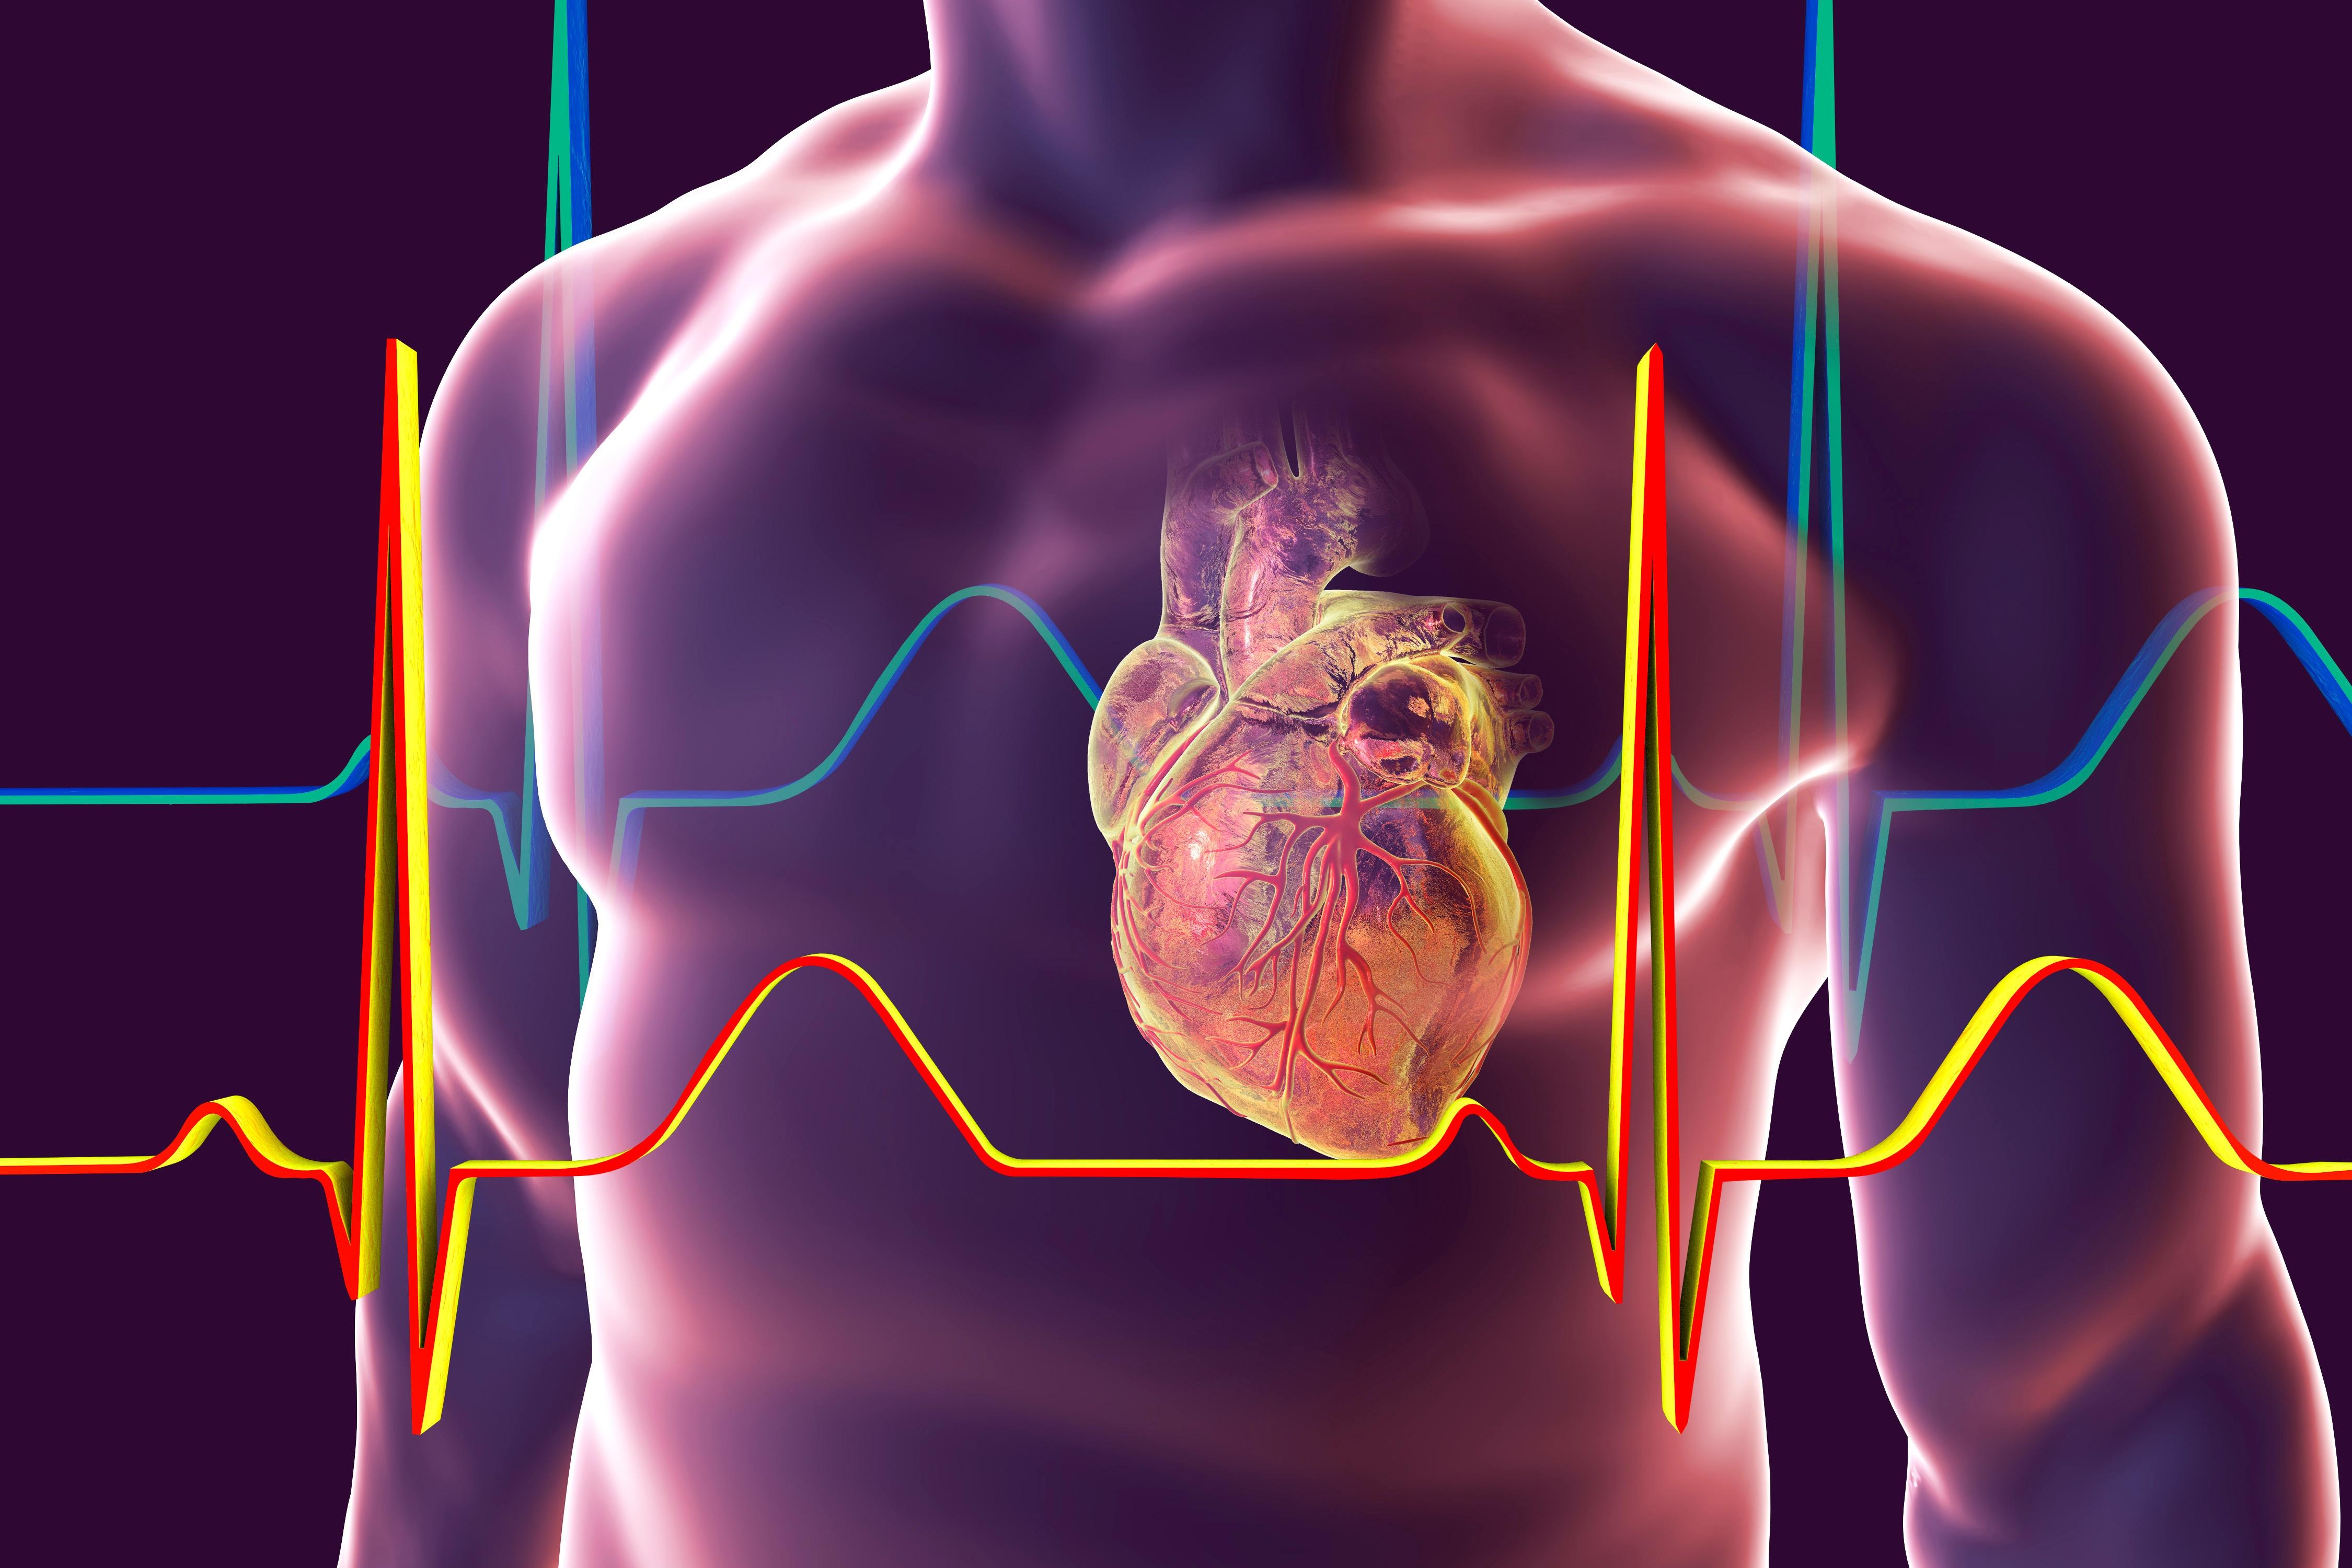 Cardiomyopathy Treatment in Rodent Models – ADA 2018